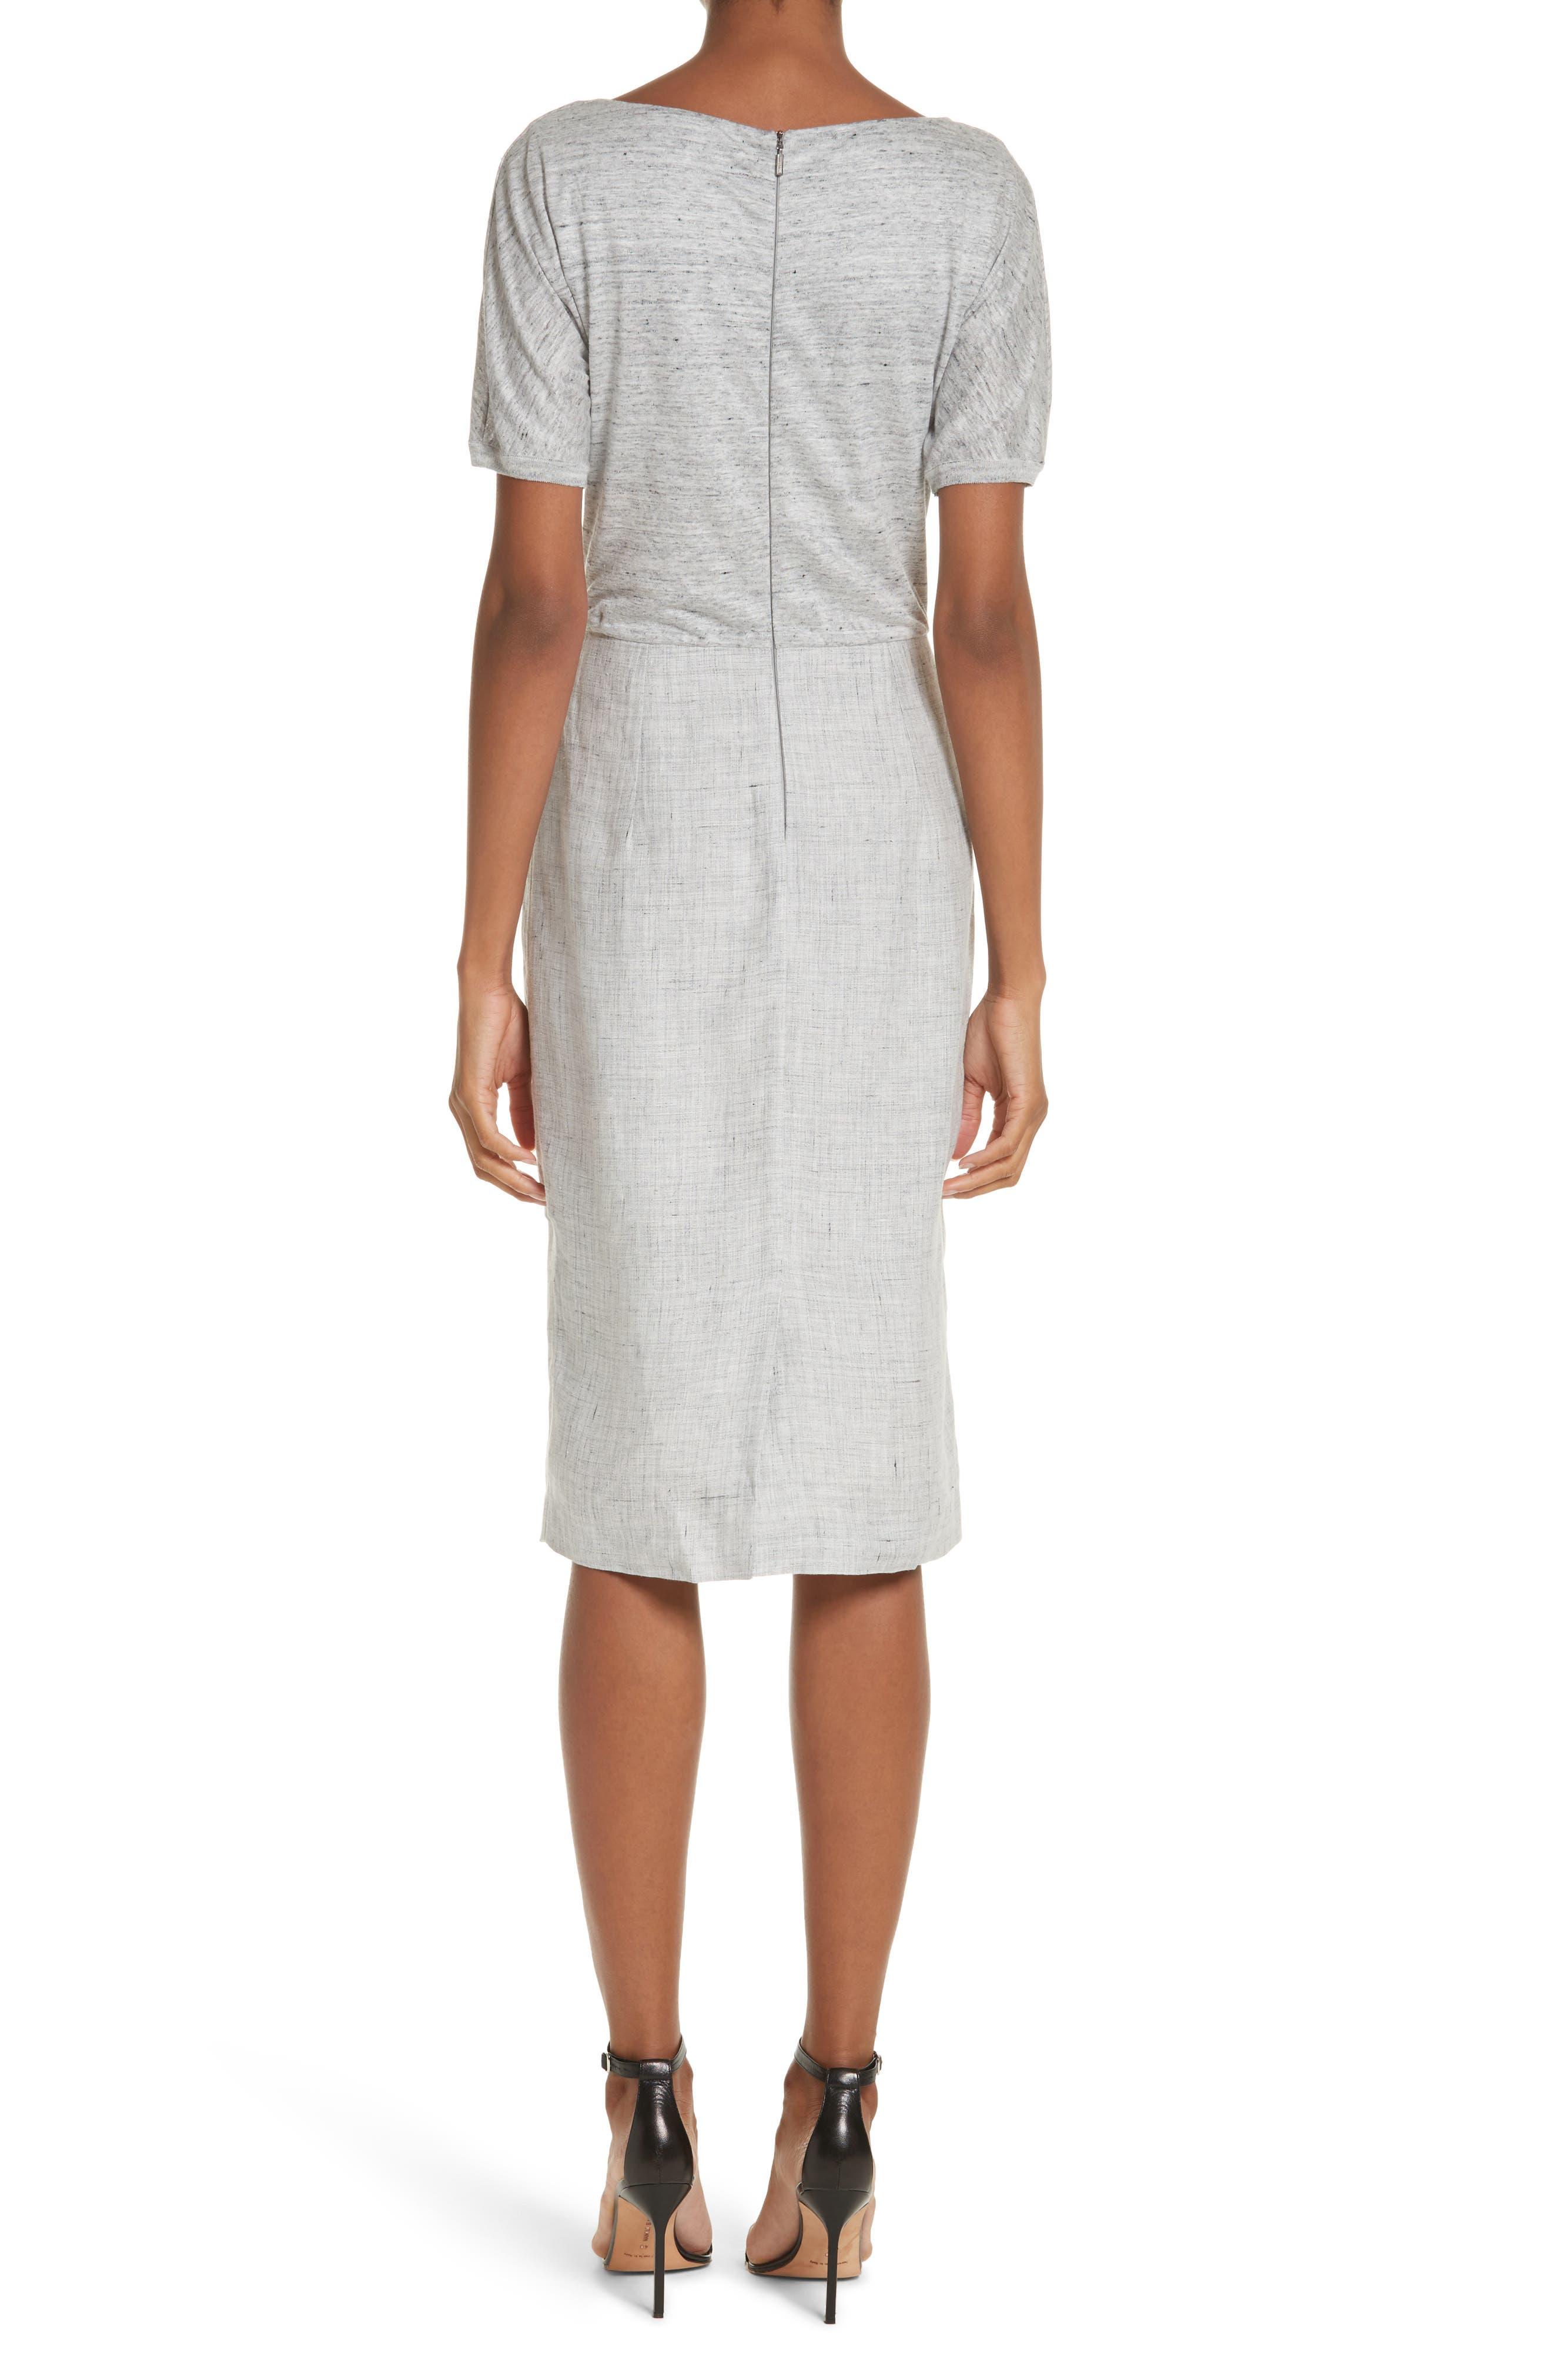 Laura Cowl Neck Linen Dress,                             Alternate thumbnail 2, color,                             Light Grey